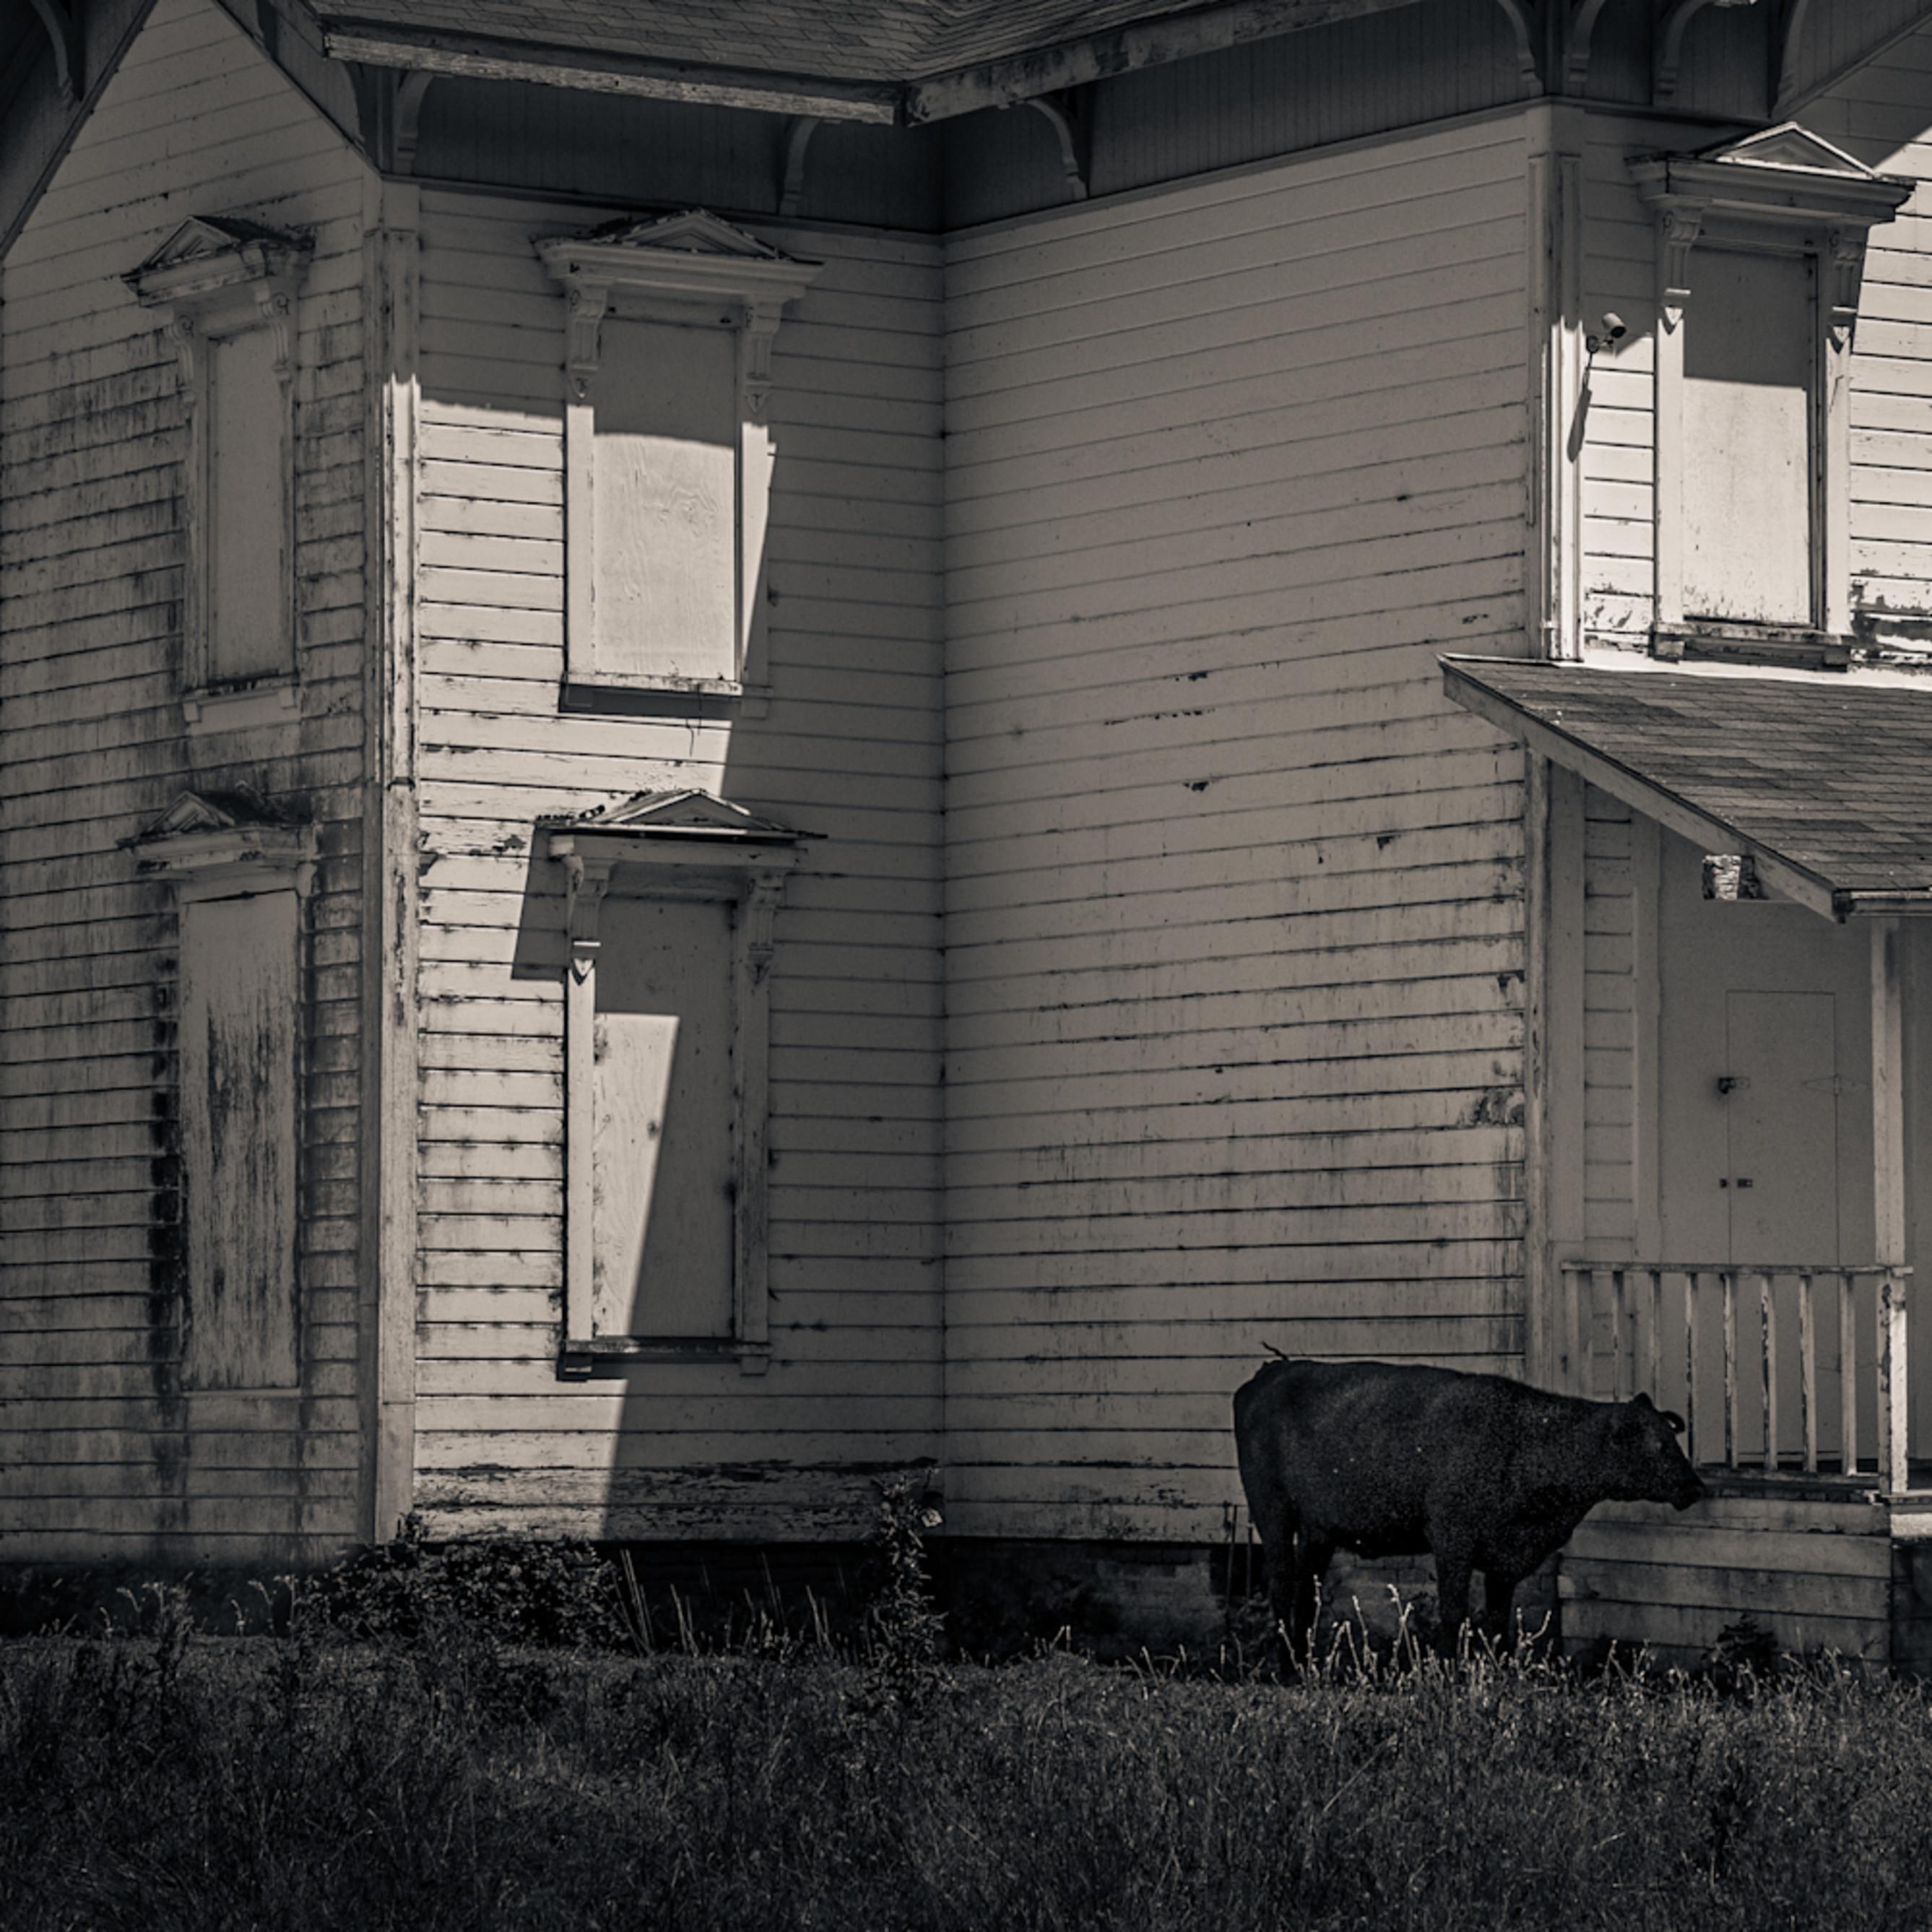 Abandoned house pt reyes gechn8